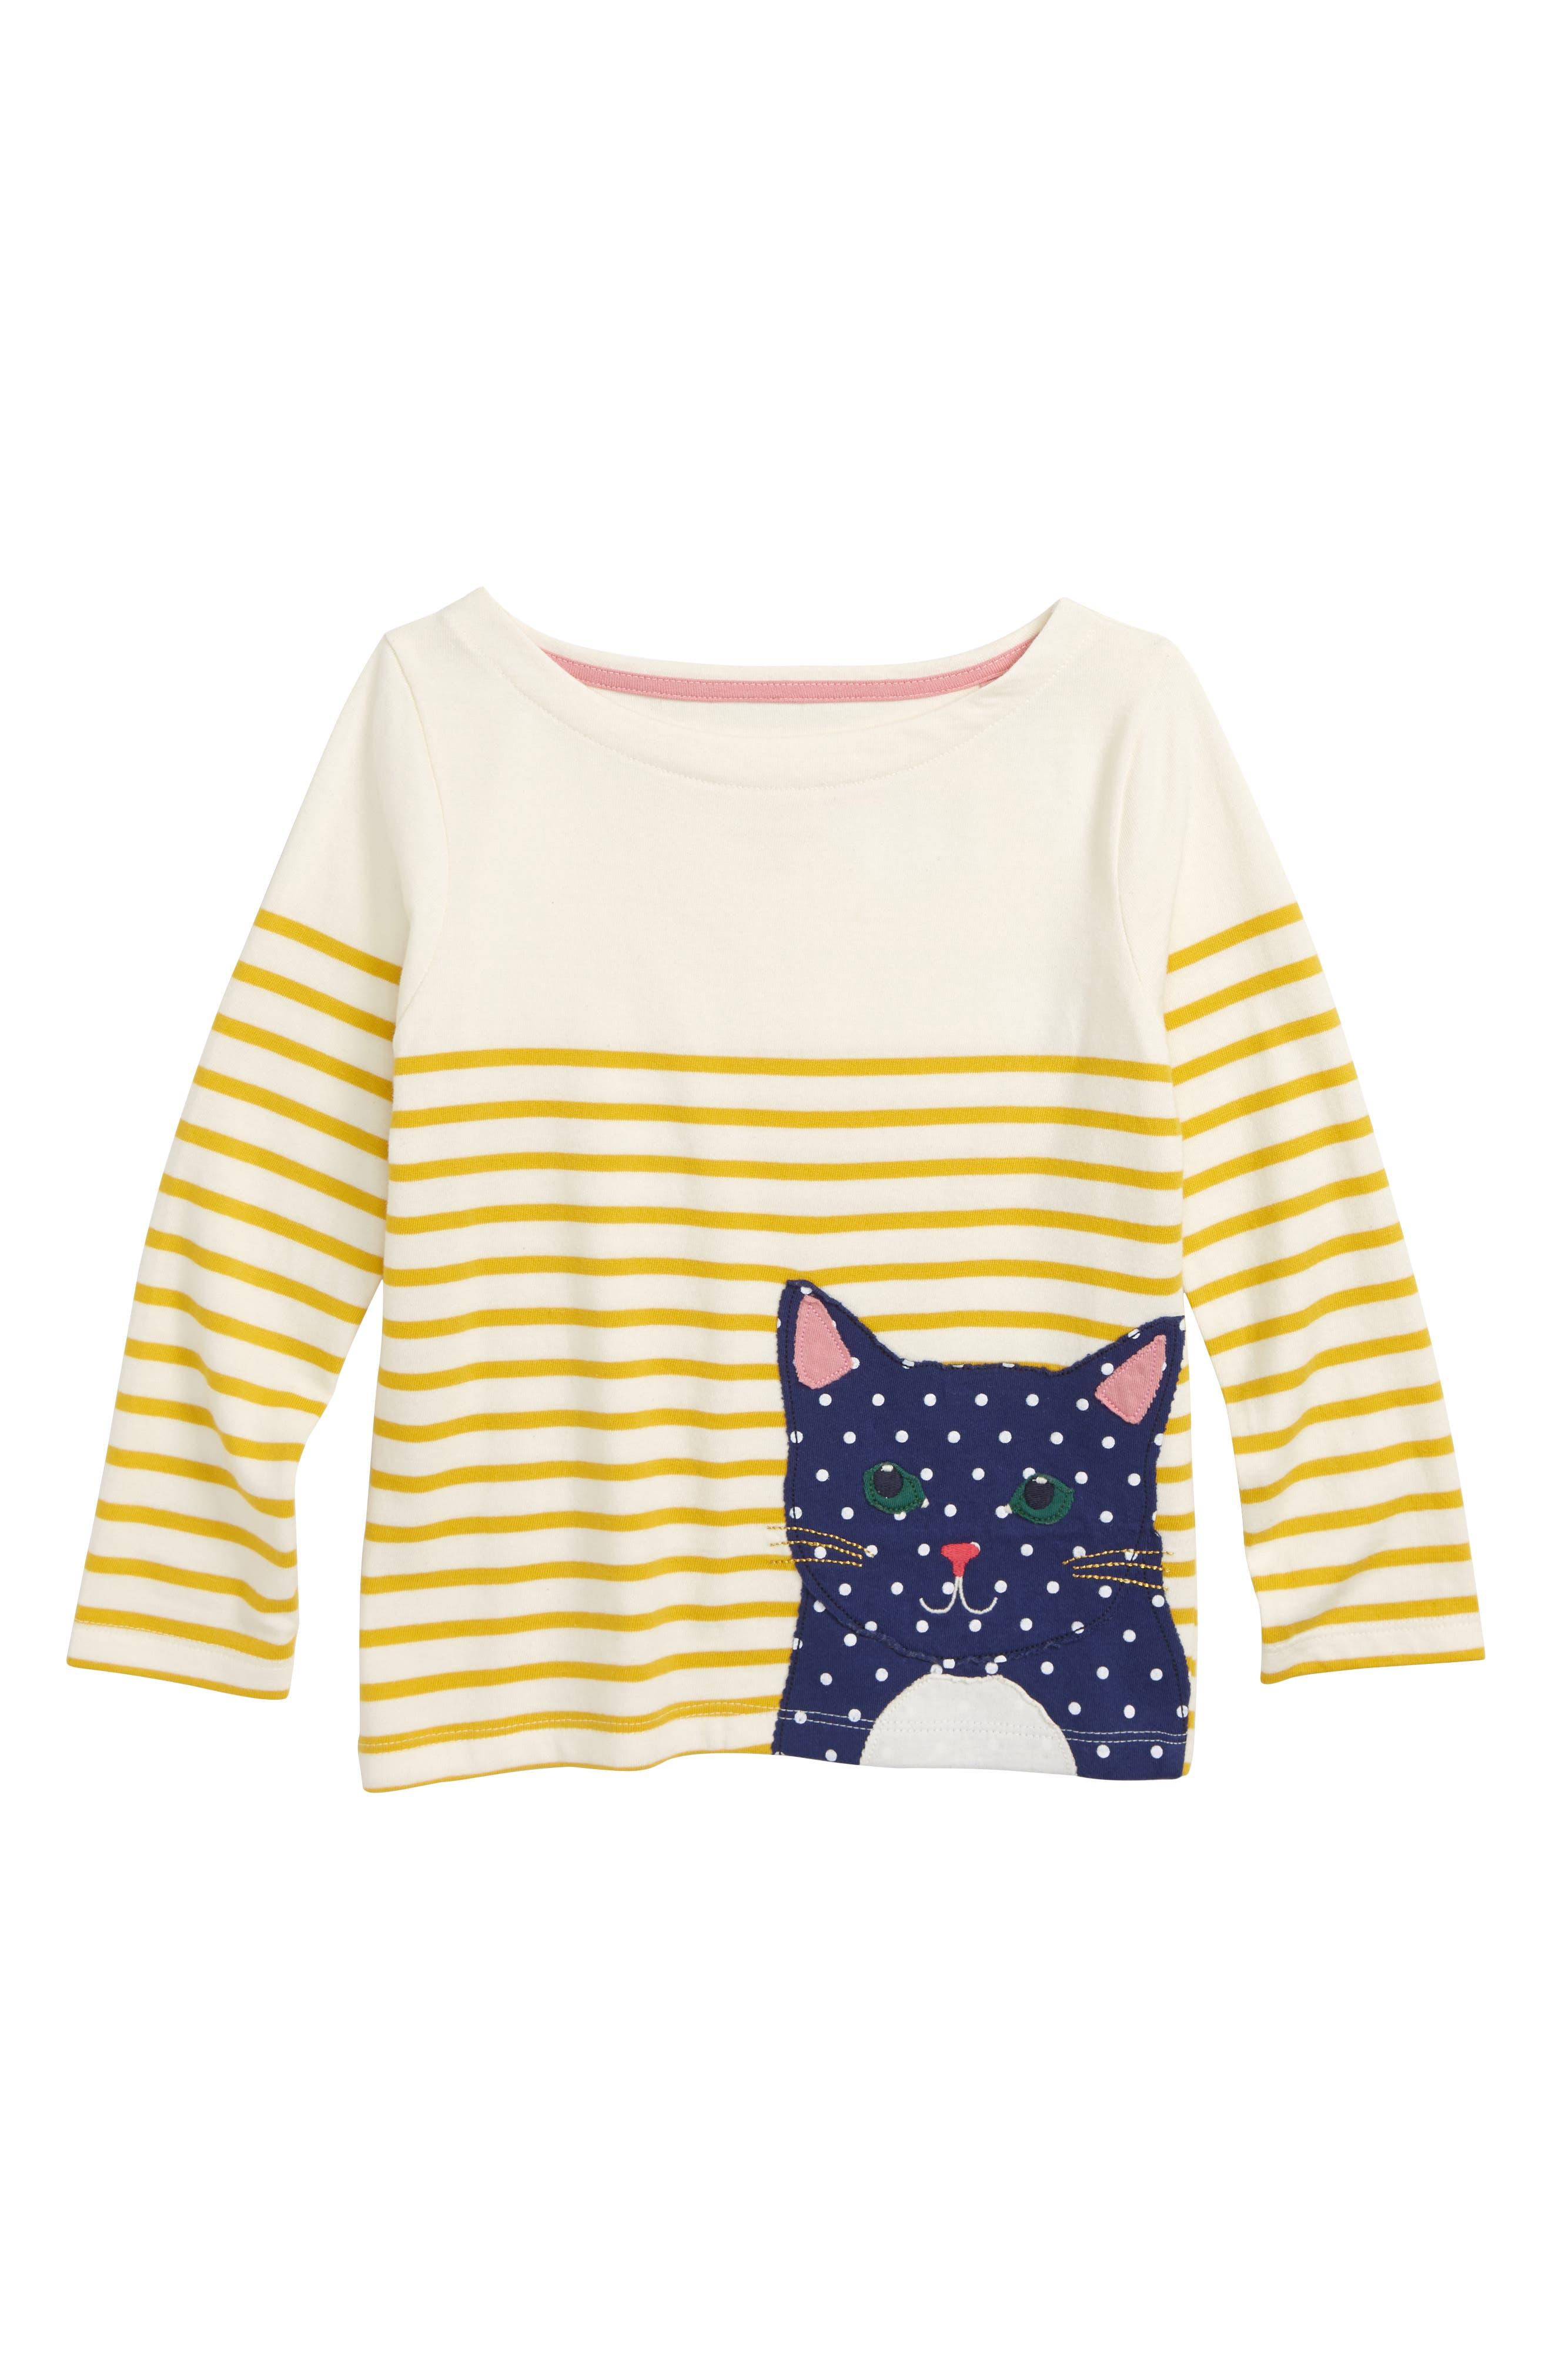 Appliqué Breton Shirt,                             Main thumbnail 1, color,                             744